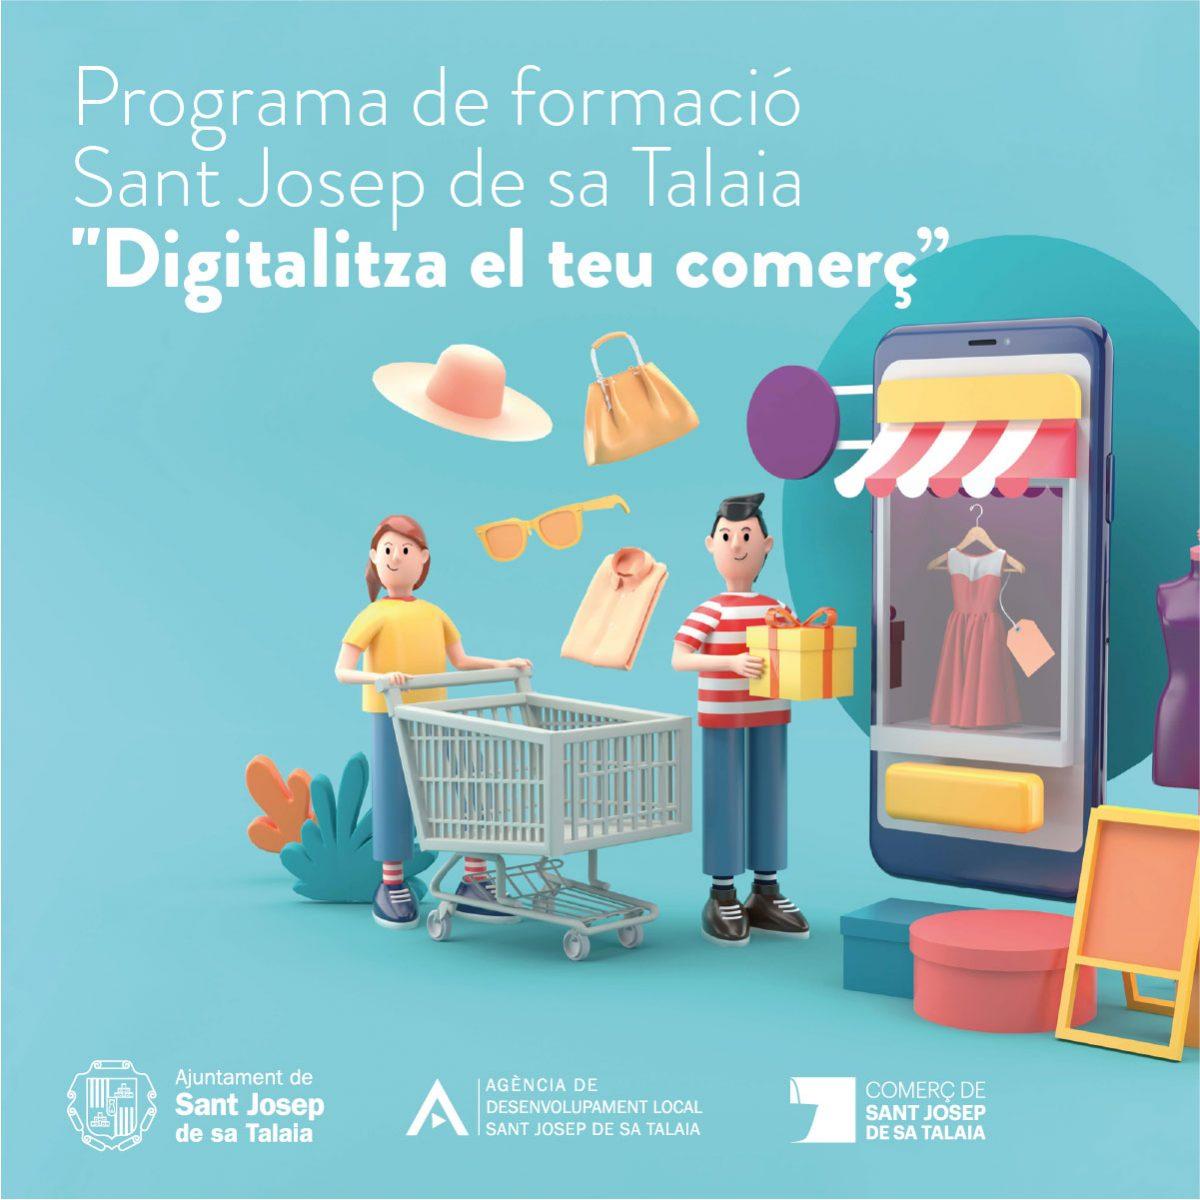 programa-de-formacion-digitaliza-tu-comercio-san-jose-ibiza-2020-welcometoibiza